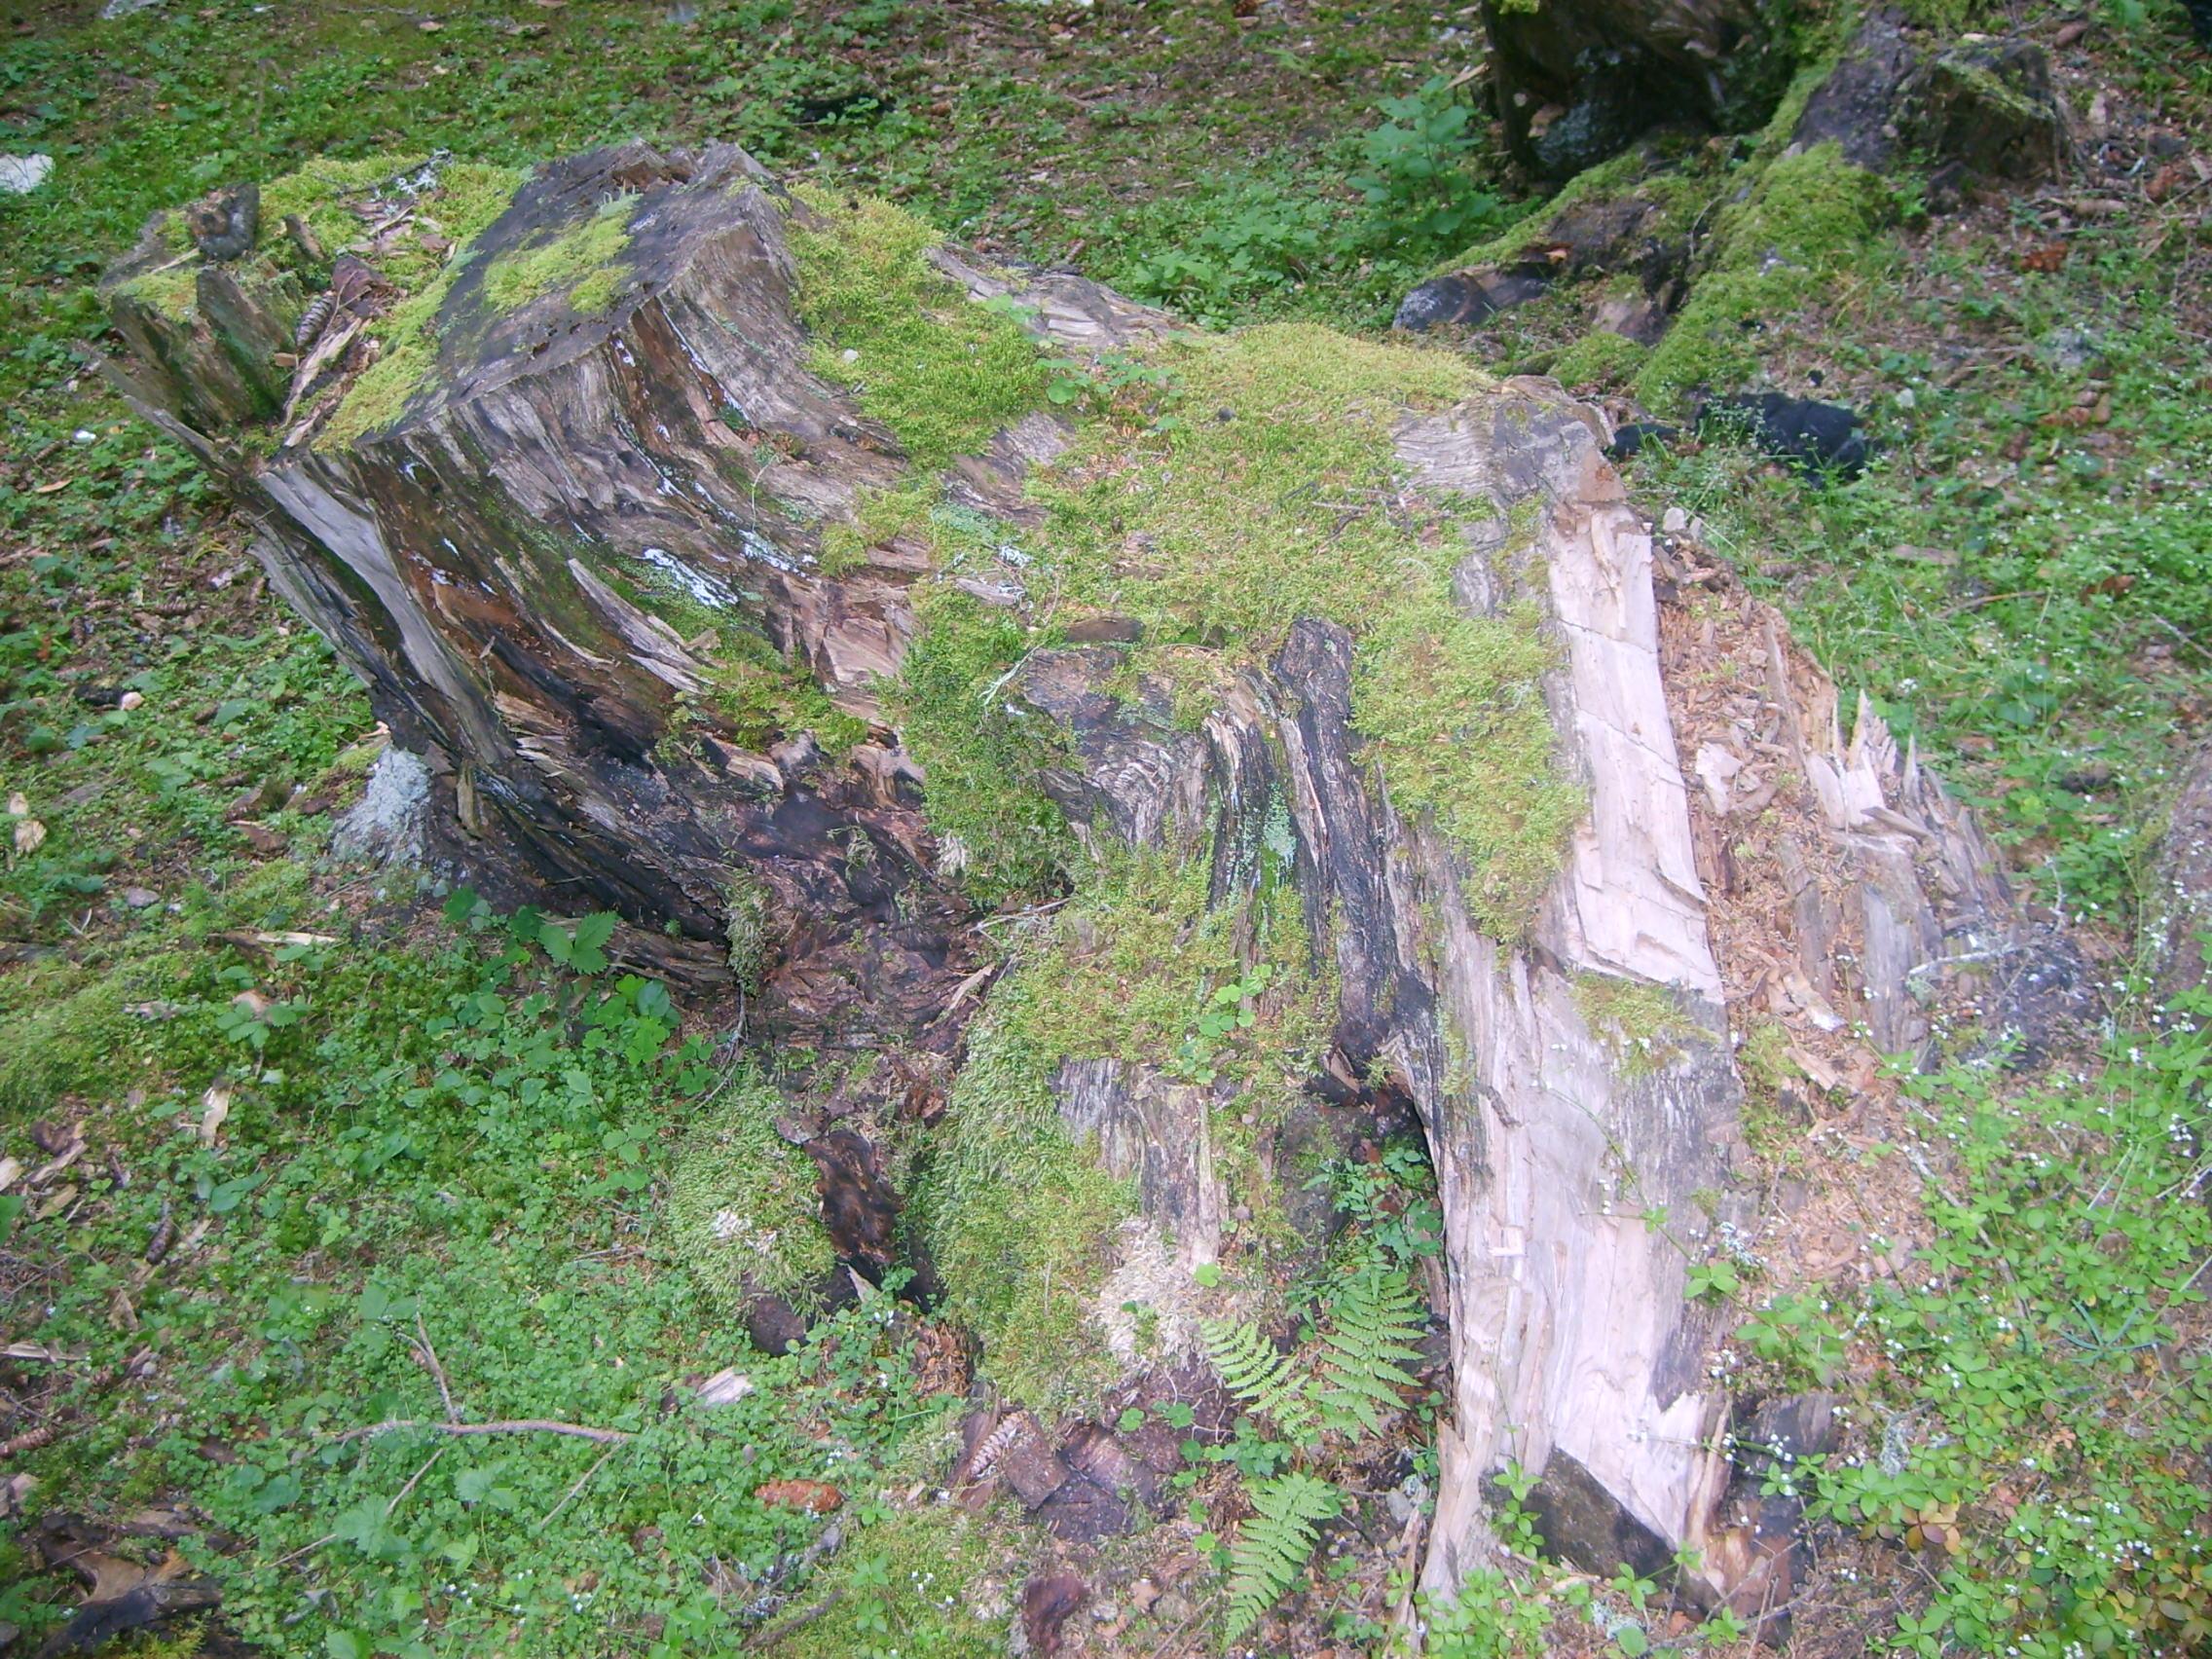 Description yosun tutmuş ağaç